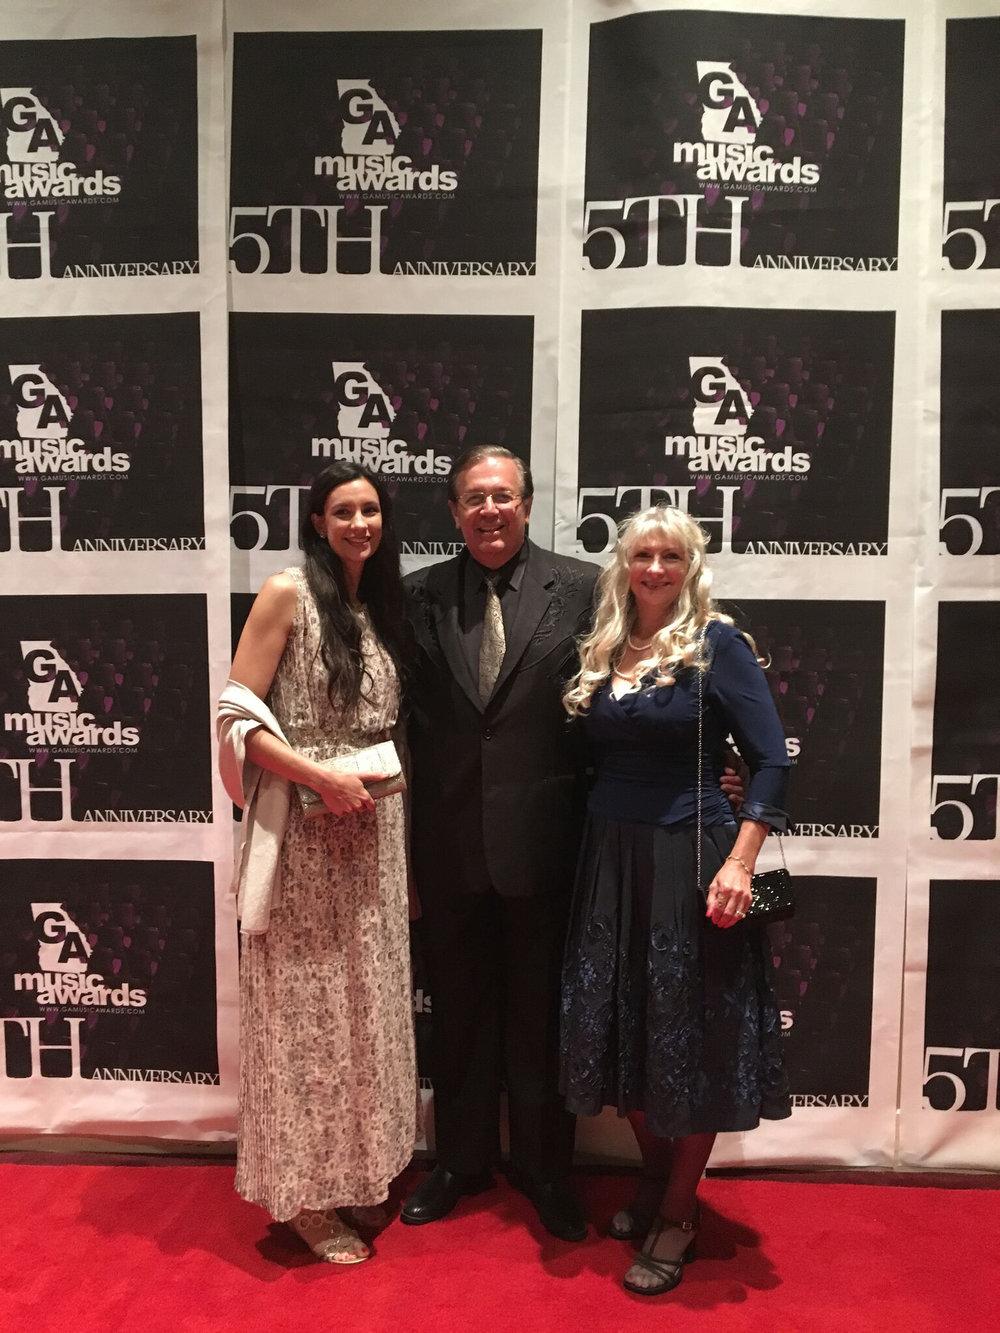 Georgia Music Awards 2016